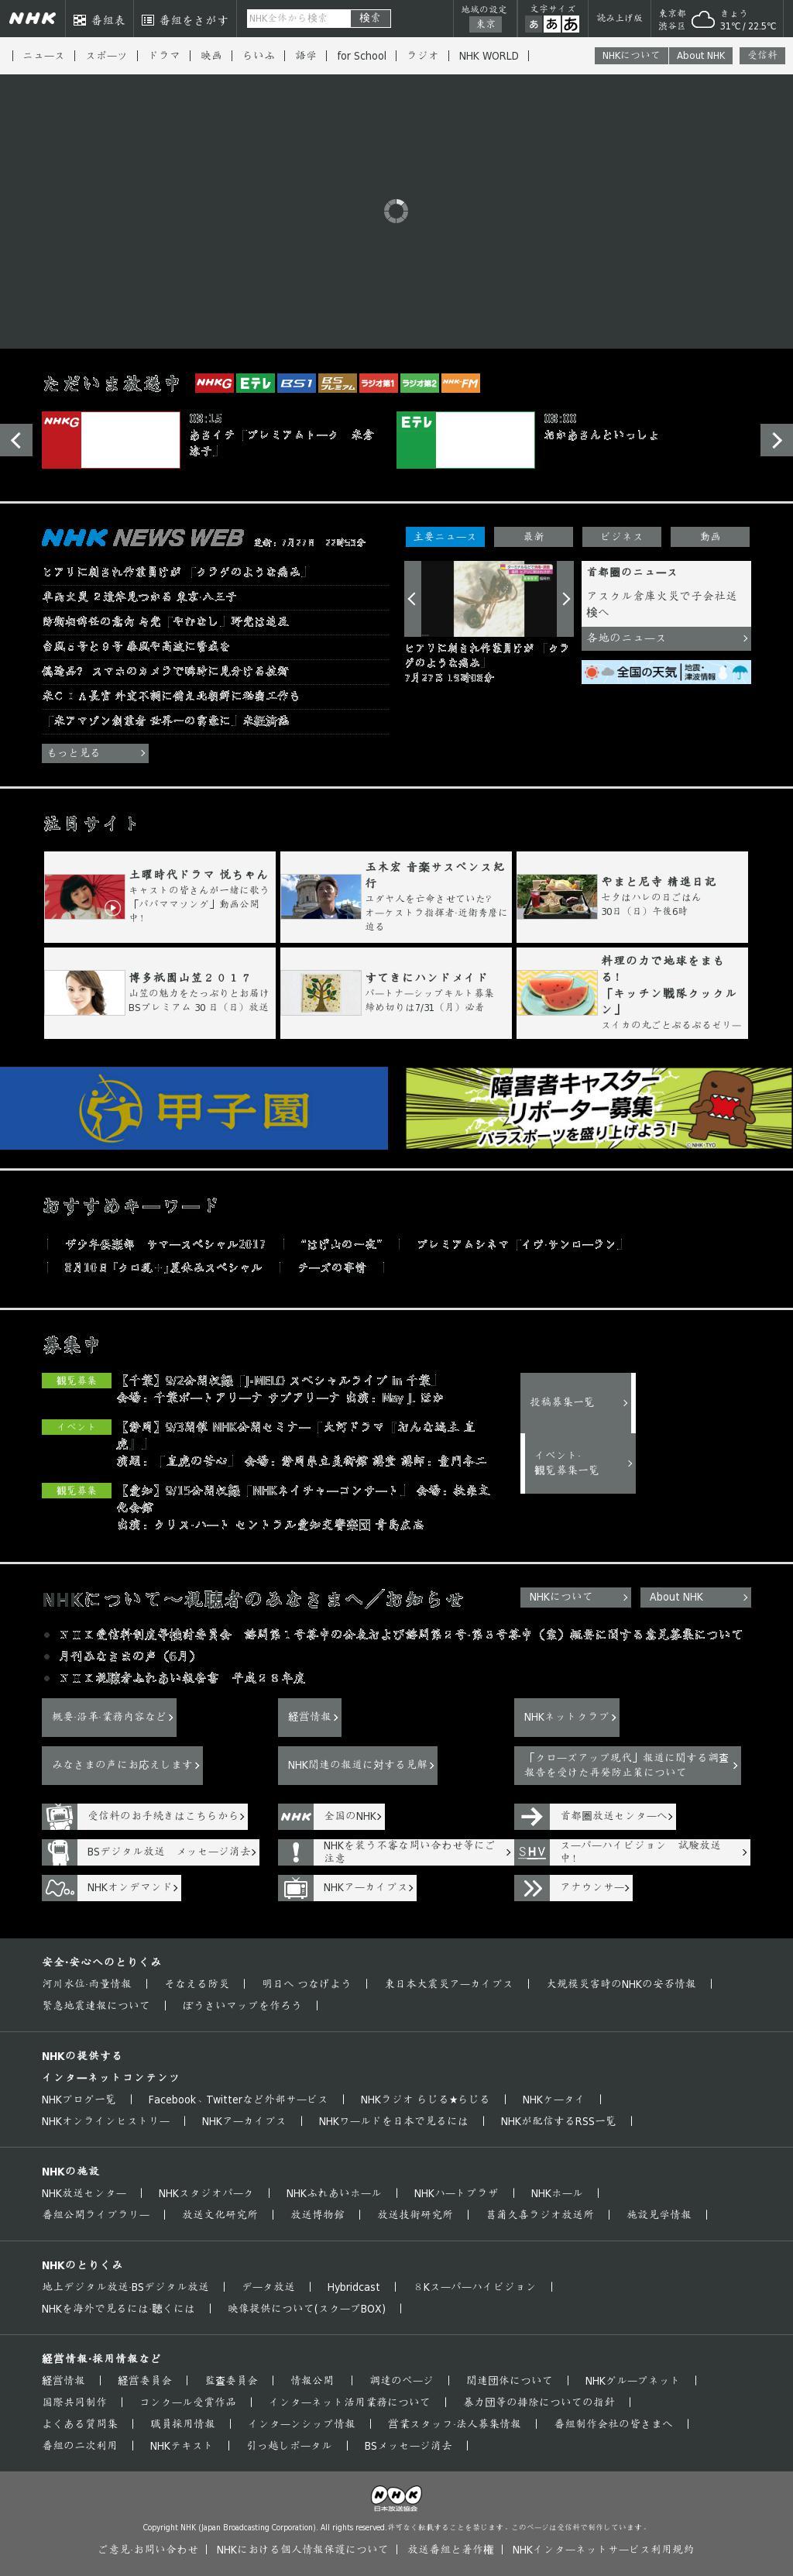 NHK Online at Thursday July 27, 2017, 11:16 p.m. UTC